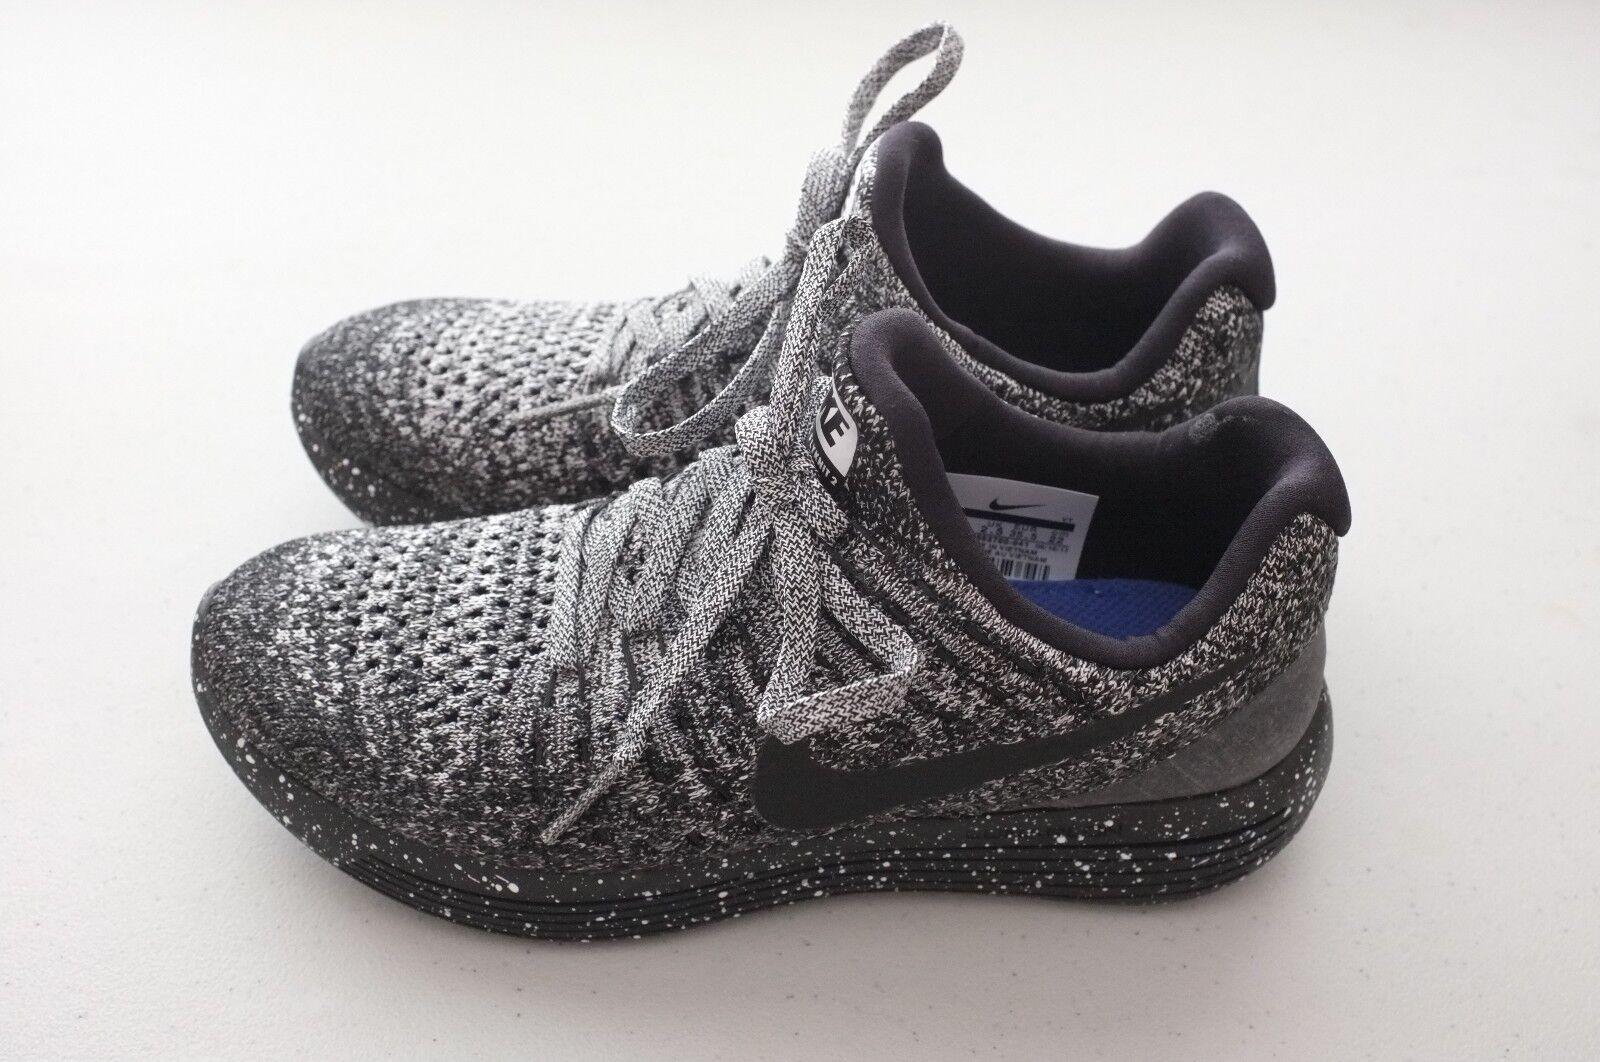 Nike Womens Lunarepic Low Flyknit 2 Running shoes Black White Sz 5 (863780-041)